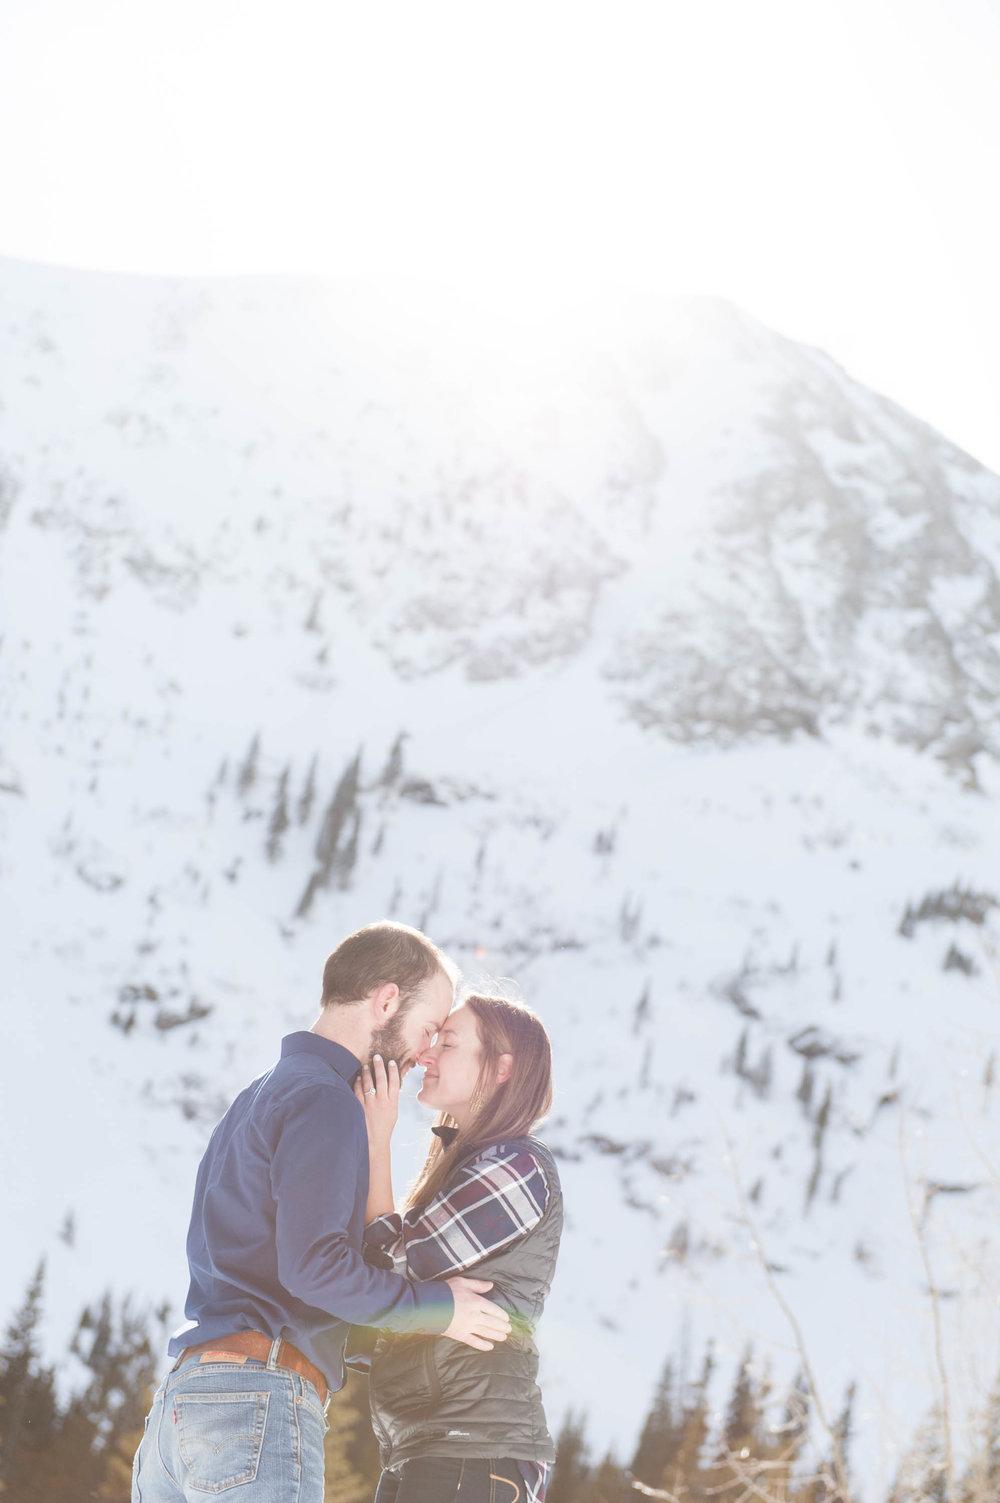 AshleighMillerWeddings-Engagement-Breckenridge-KaitBen-1318-blog.jpg